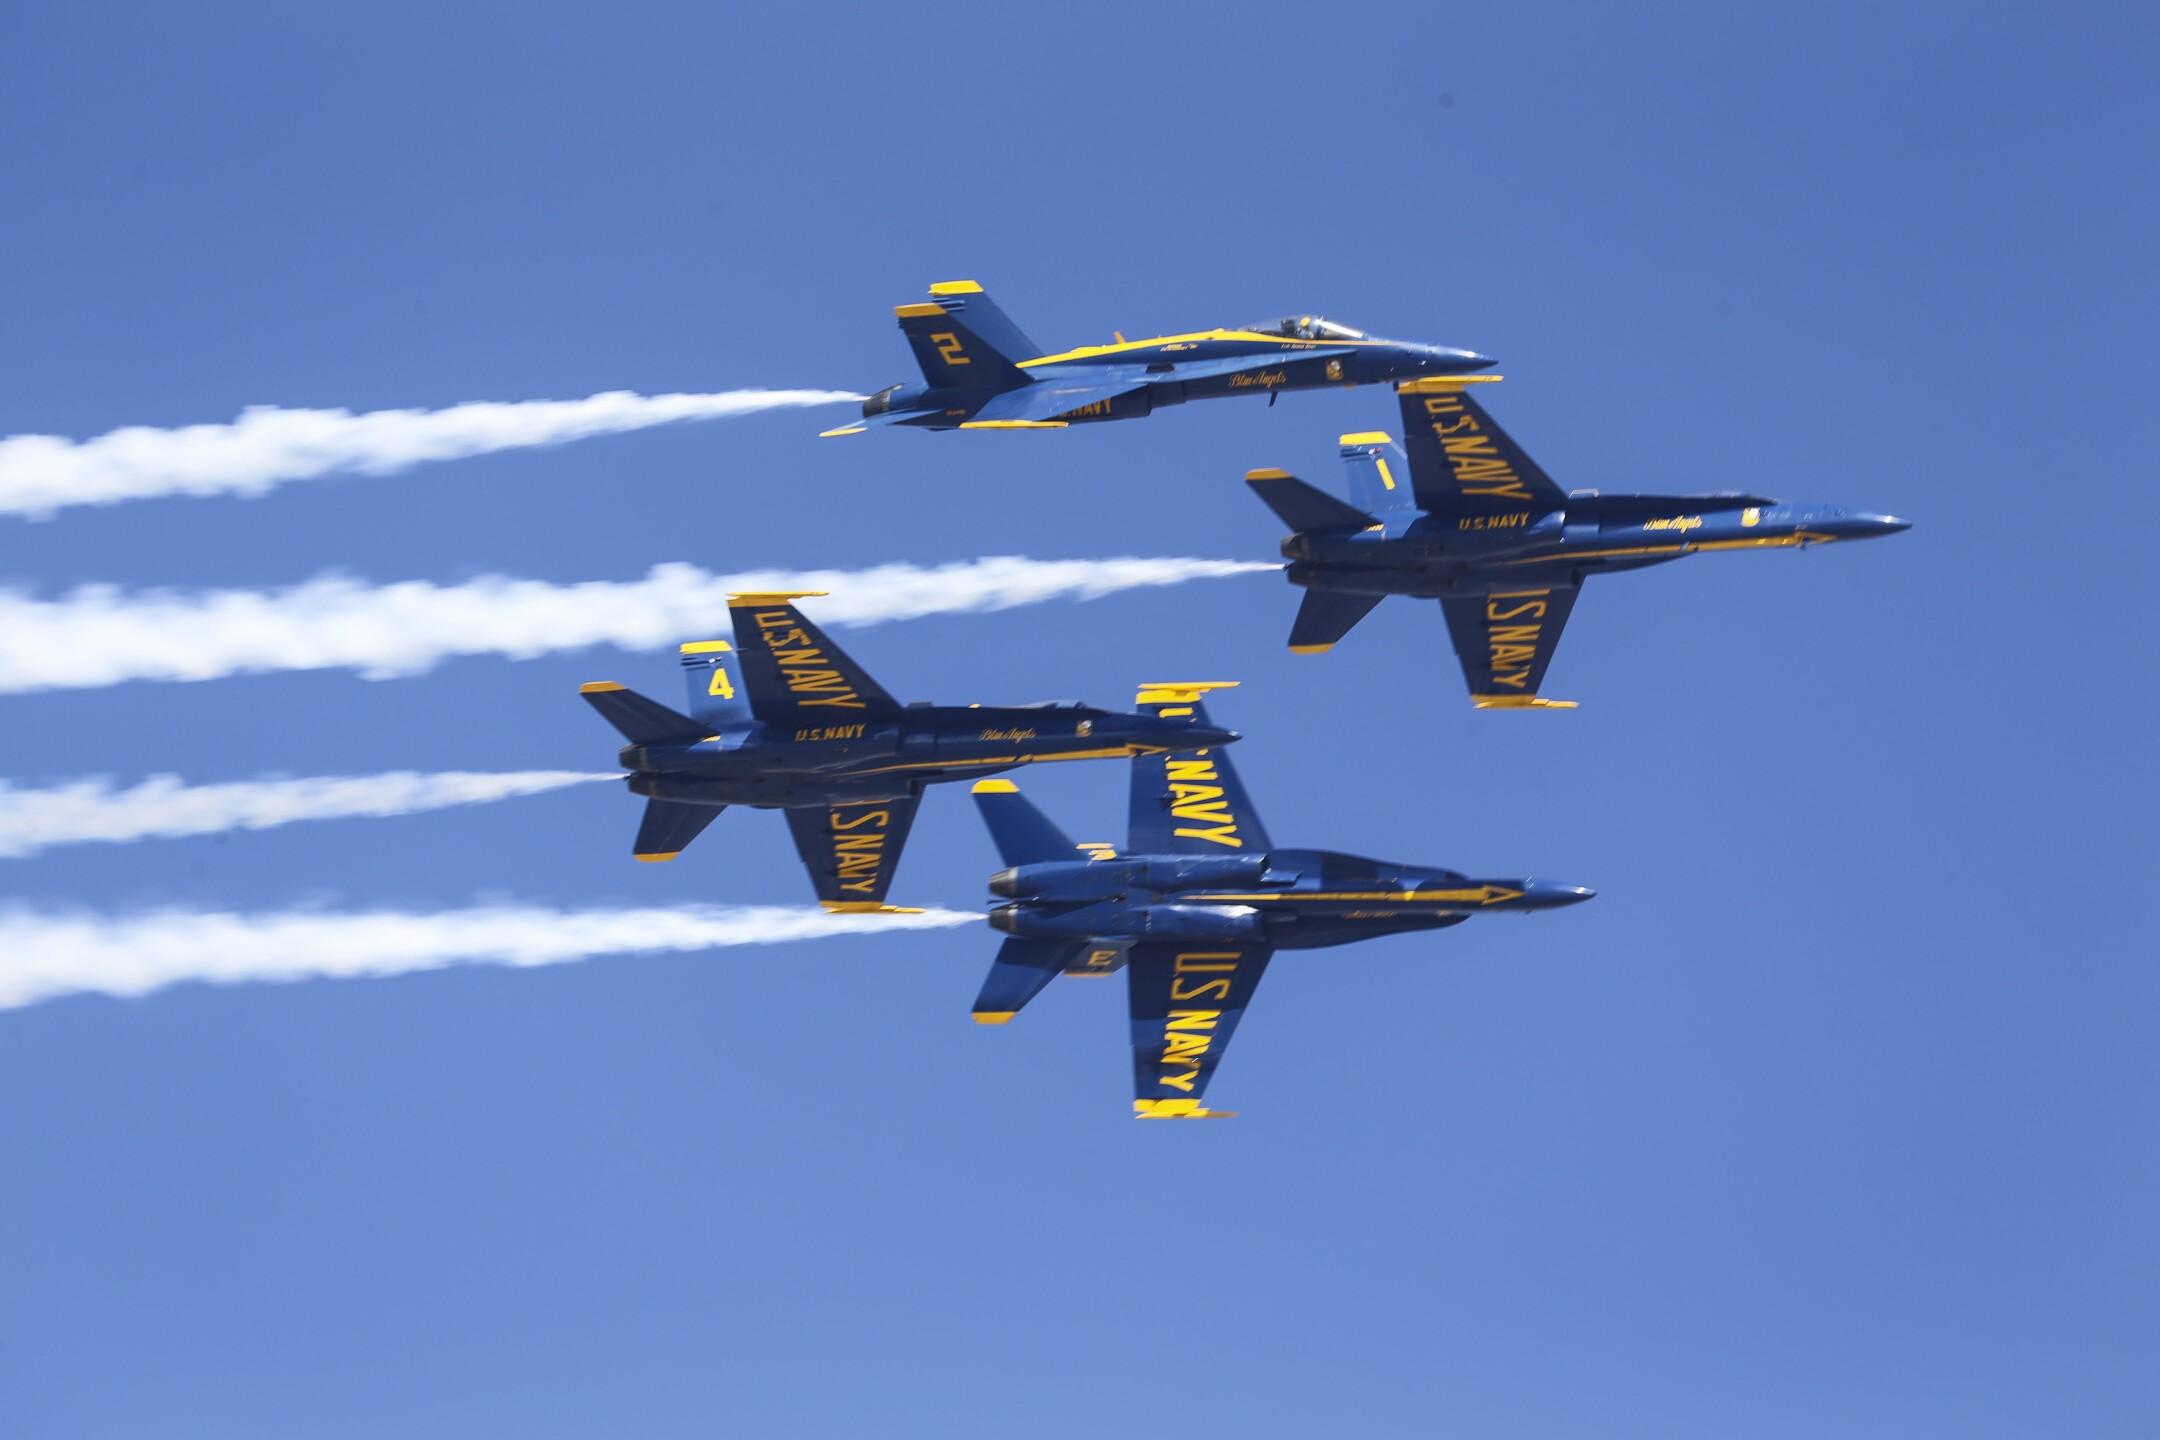 US Navy Blue Angels 2018 MCAS Miramar Air Show